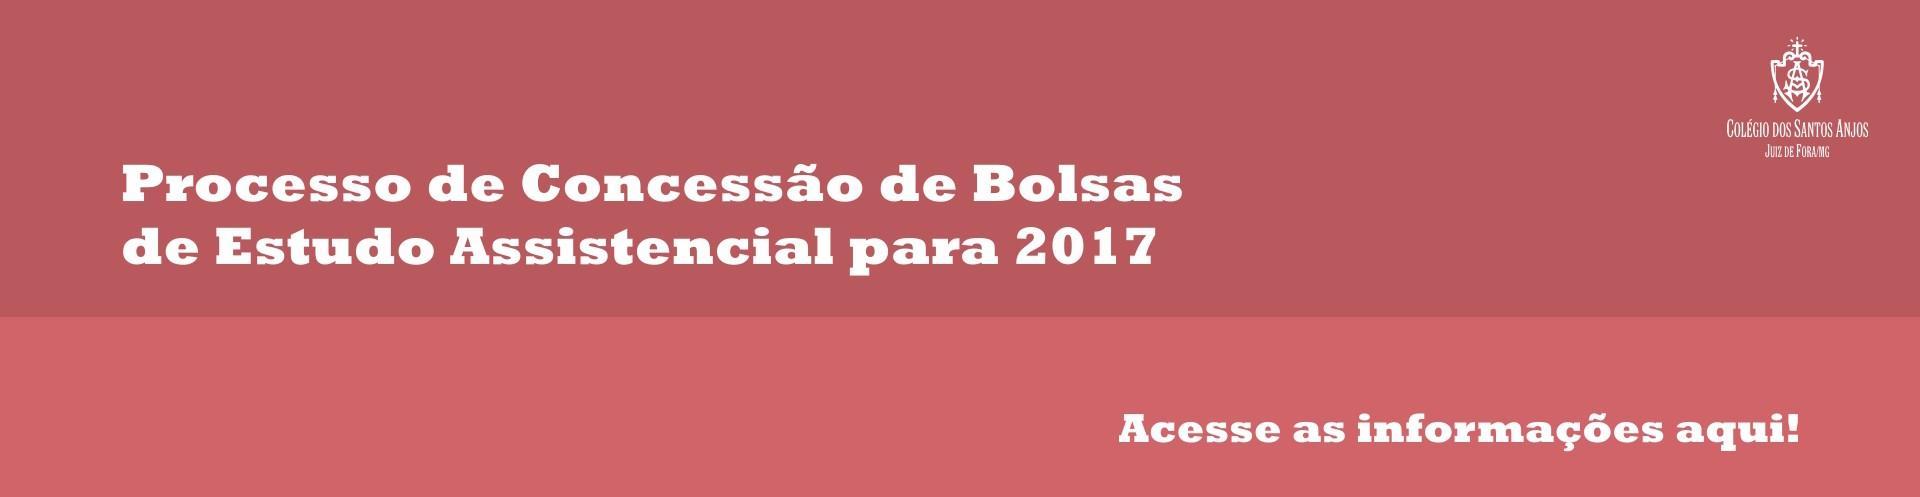 20160805_concessaodebolsas2017_BANNER